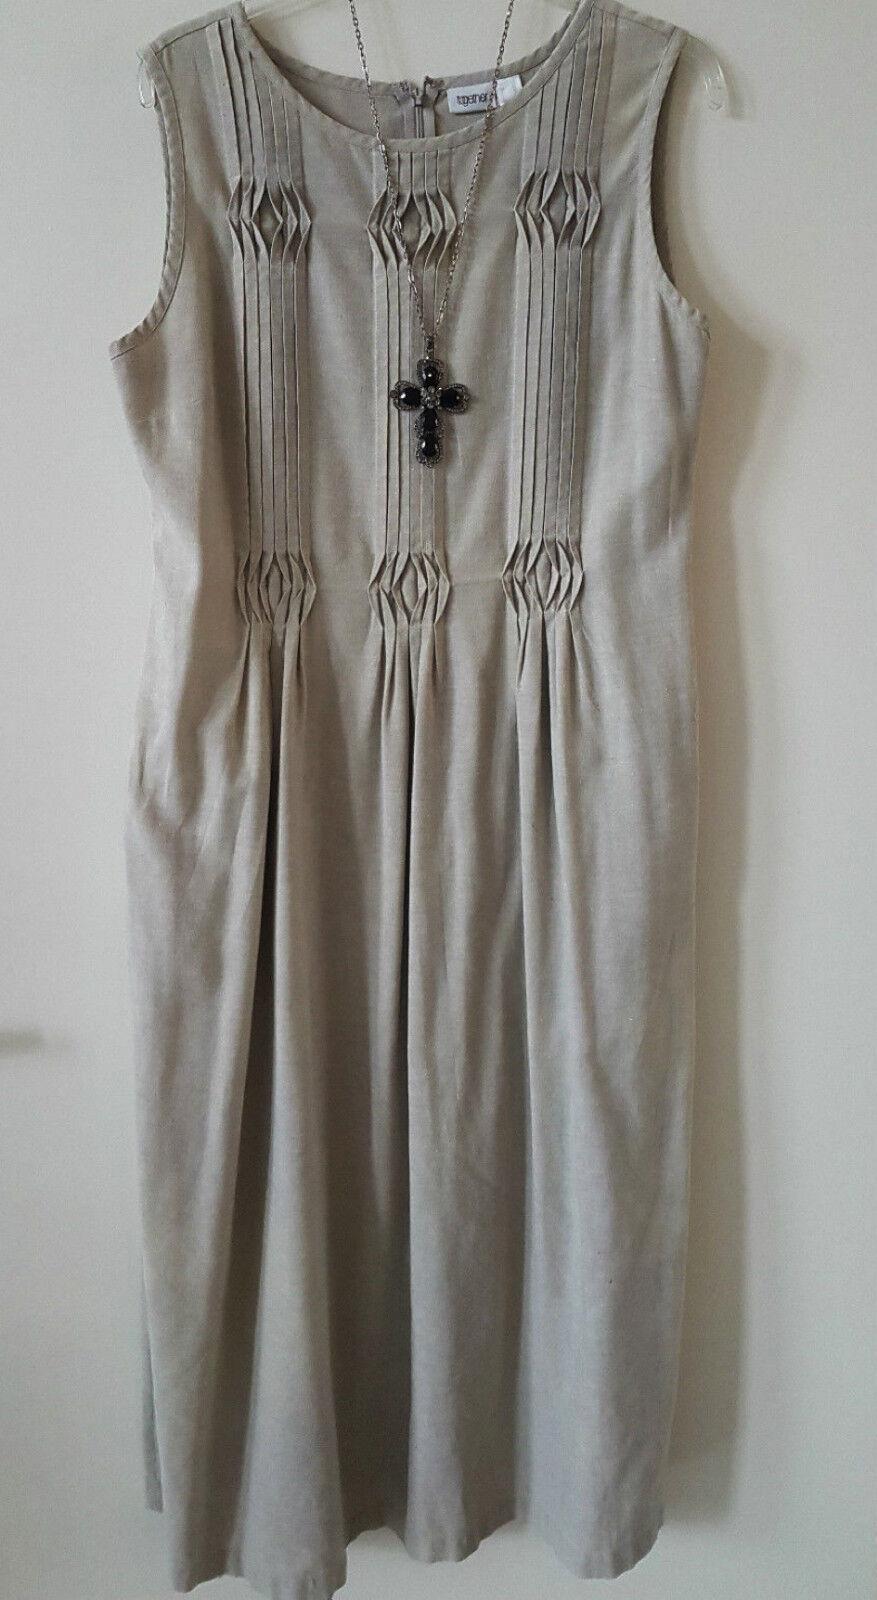 24b02925c0a15b ärmelloses Leinenkleid Kleid Umstandskleid Gr.42 Sand hell Beige Together  Farbe npycli2182-neue Kleidung